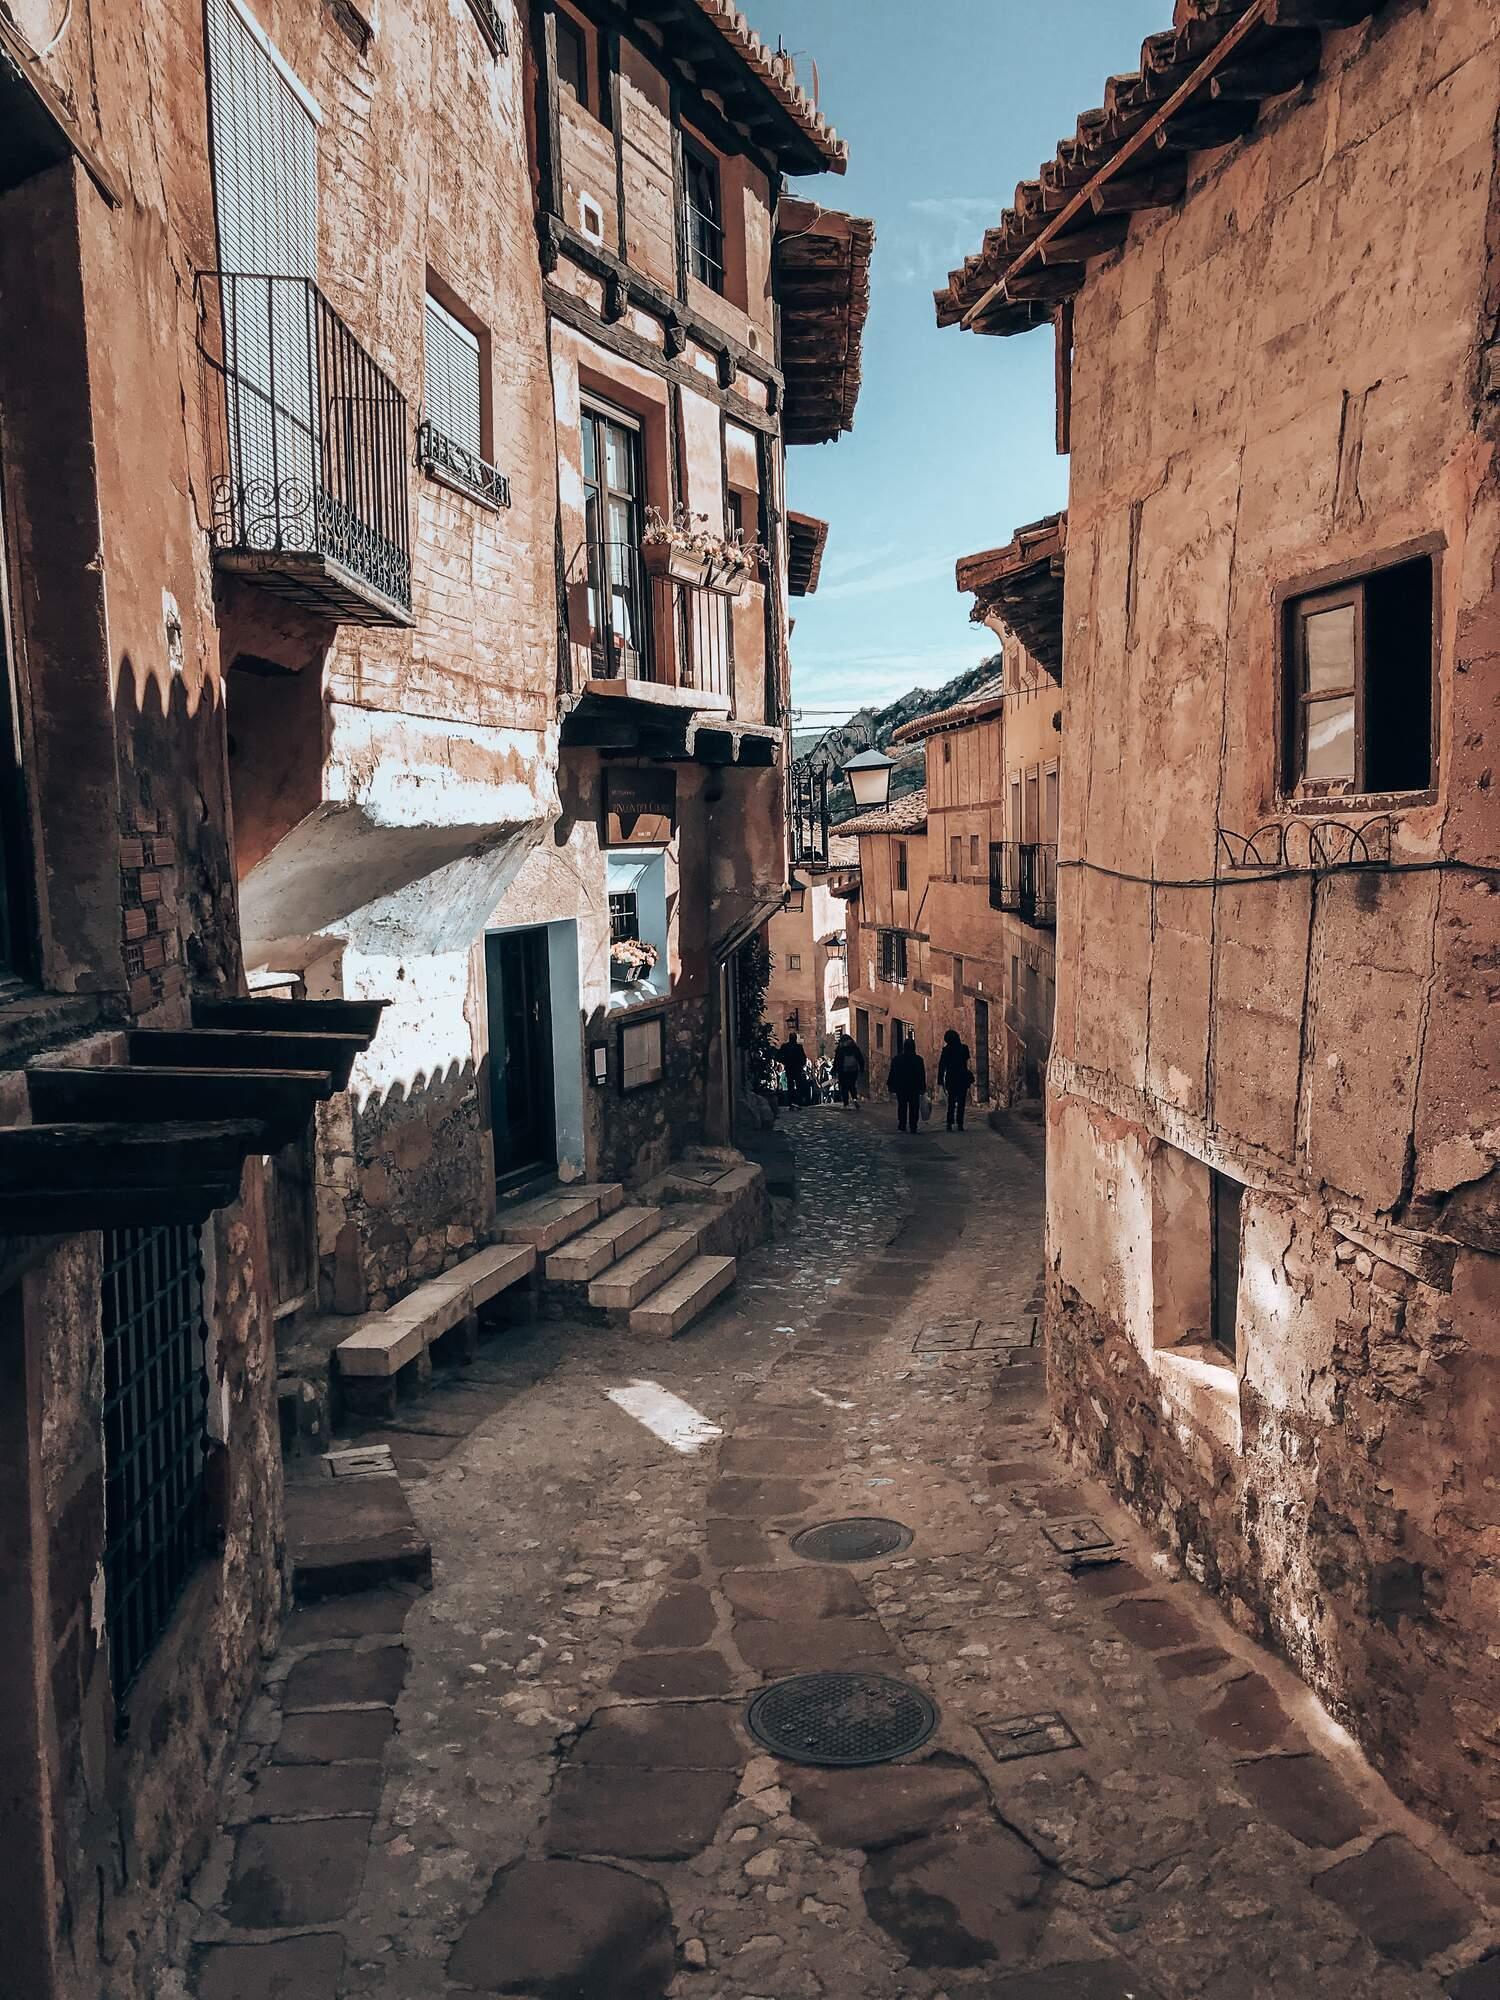 Walking the streets of the enchanting Albarracin in Spain.